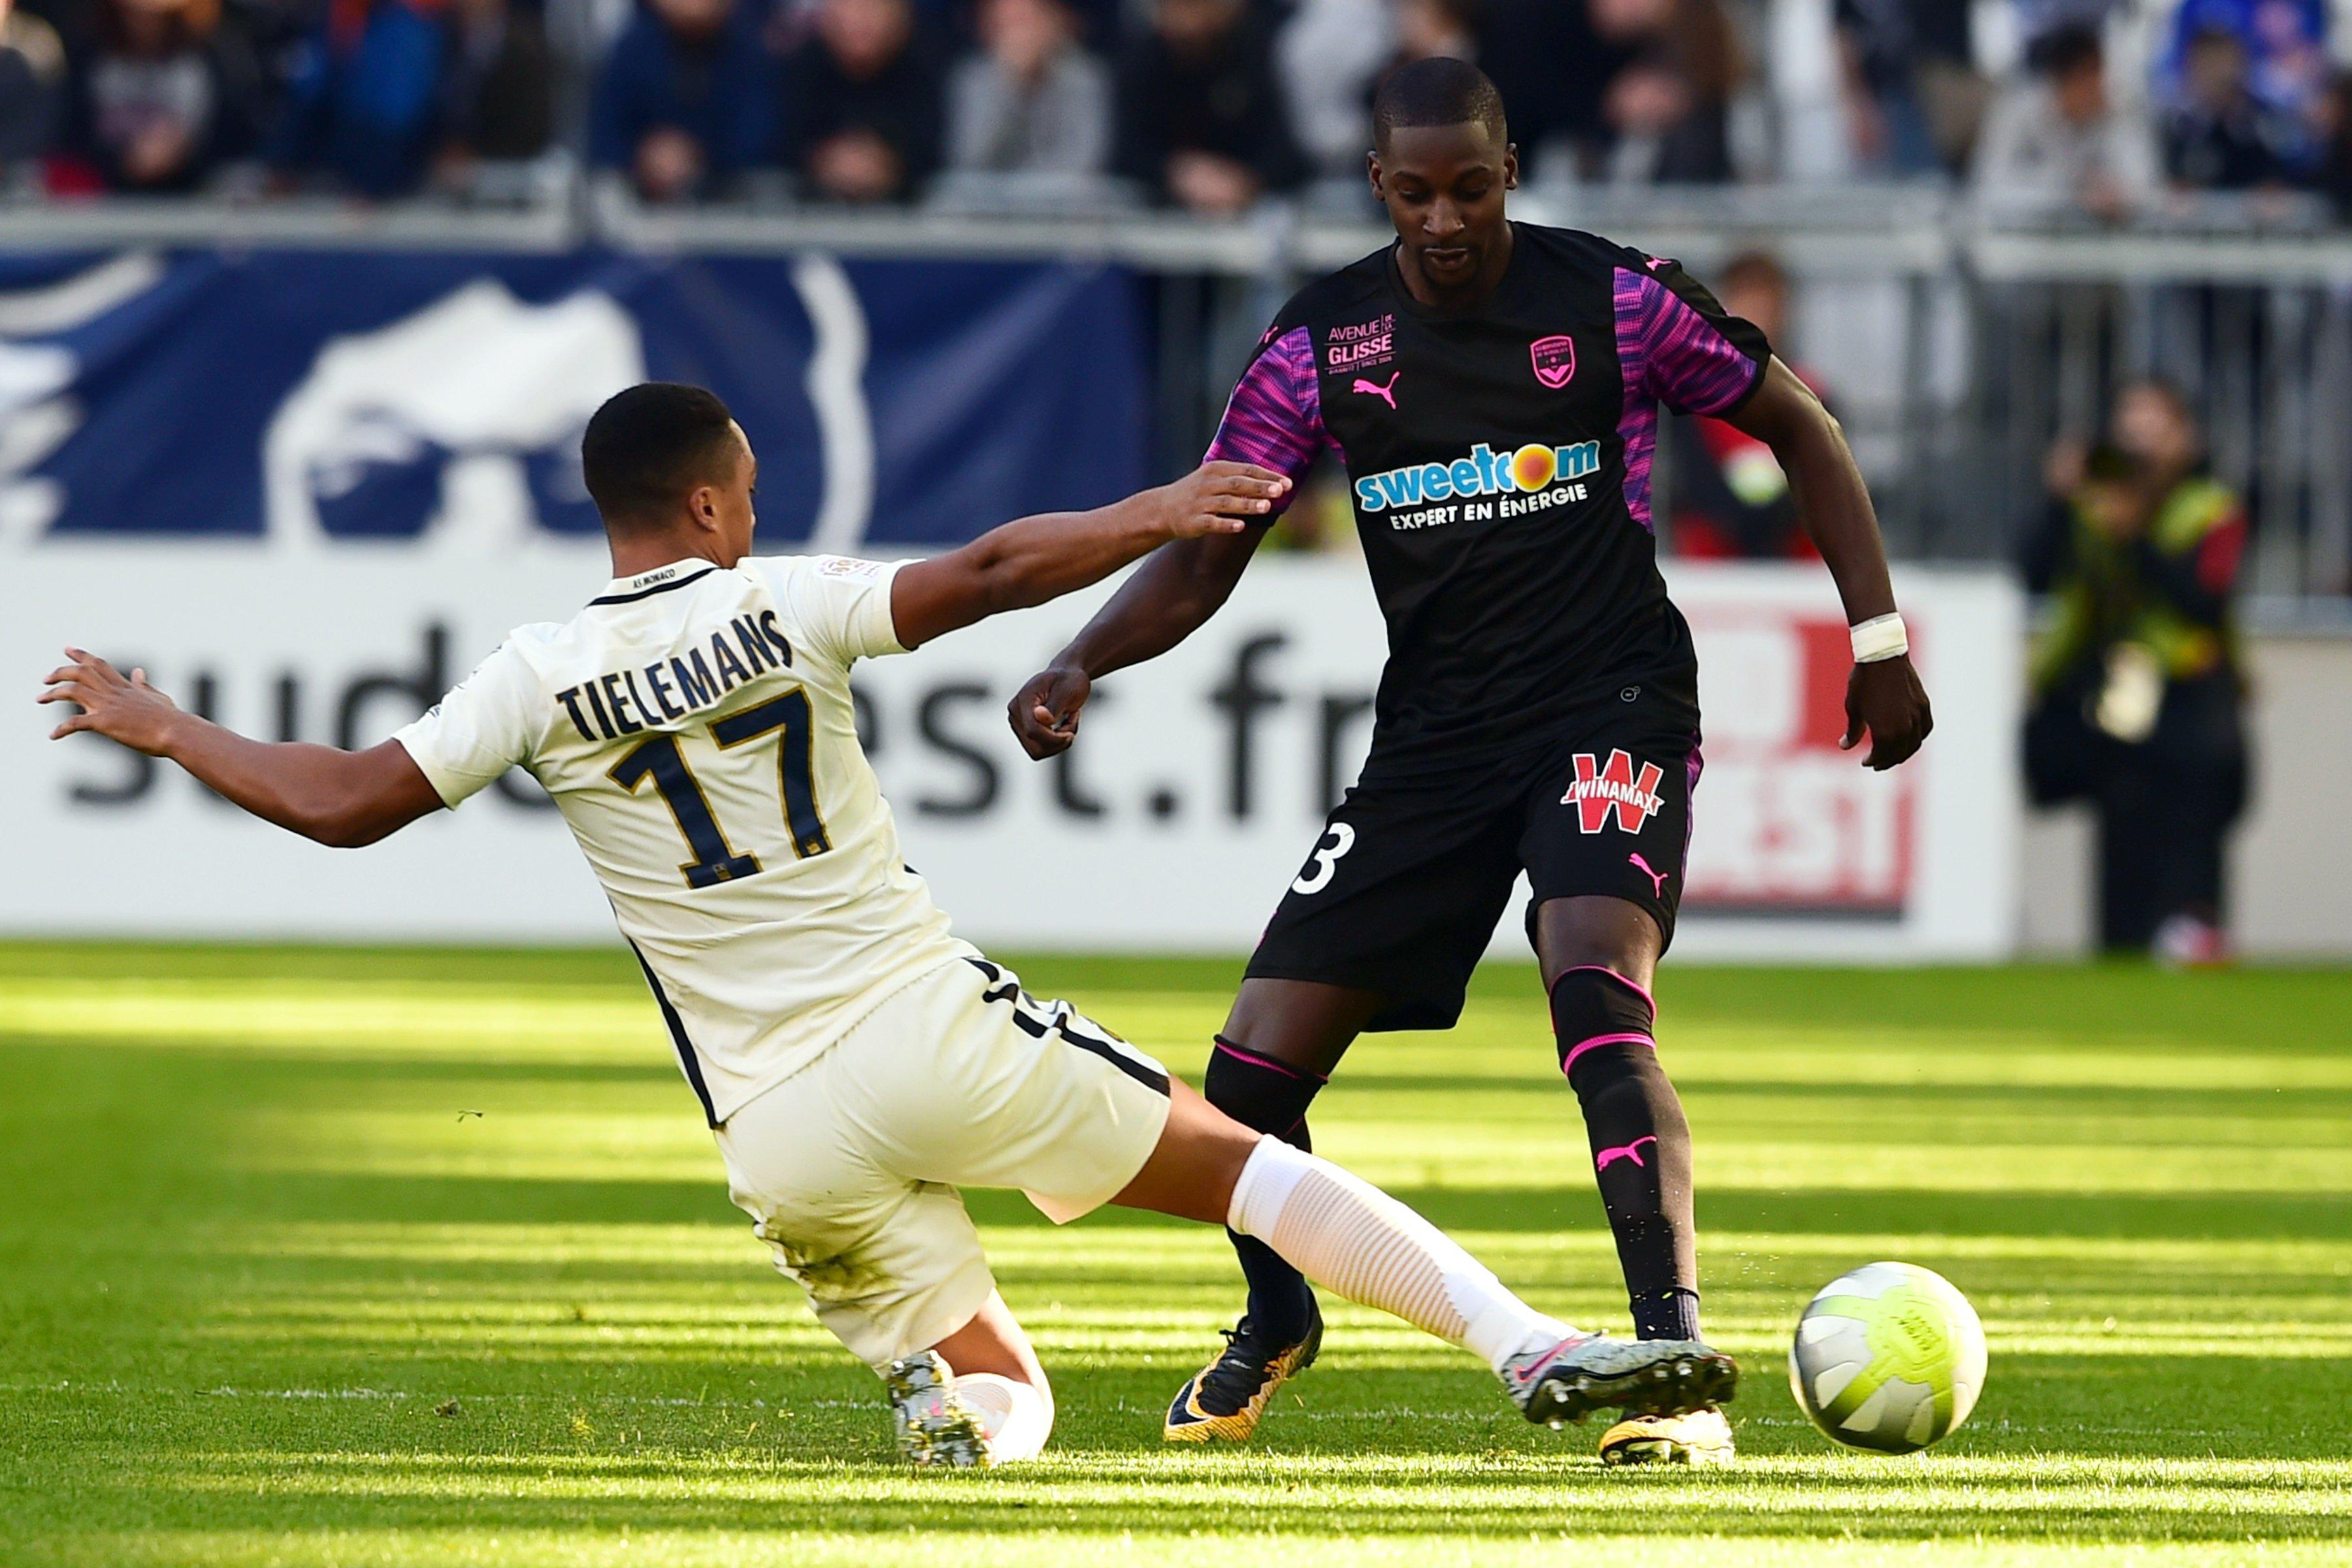 Ставки на футбол на Гент — Бордо. Ставки на Лигу Европы 23 Августа 2018